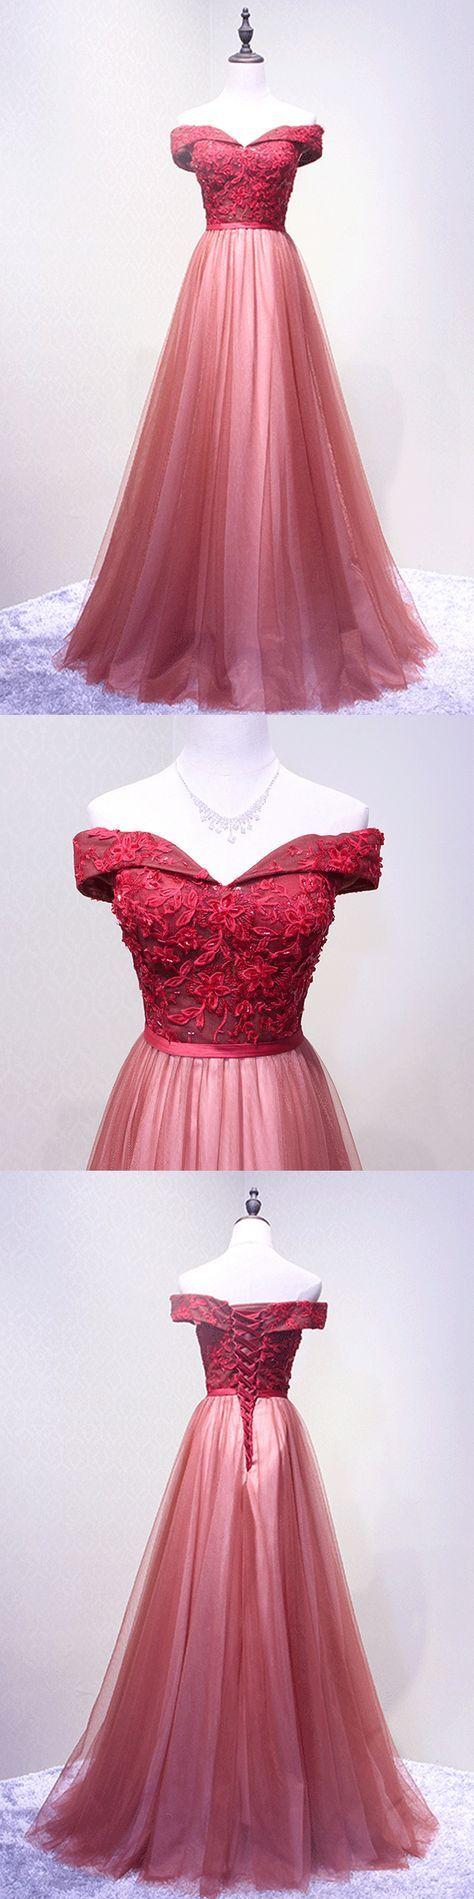 Long Prom Dresses, Tulle Prom Dresses, Elegant Party Prom Dresses, Off-Shoulder Evening Dresses, Lace Prom Dresses , Floor-Length Prom Dresses Online, LB0423